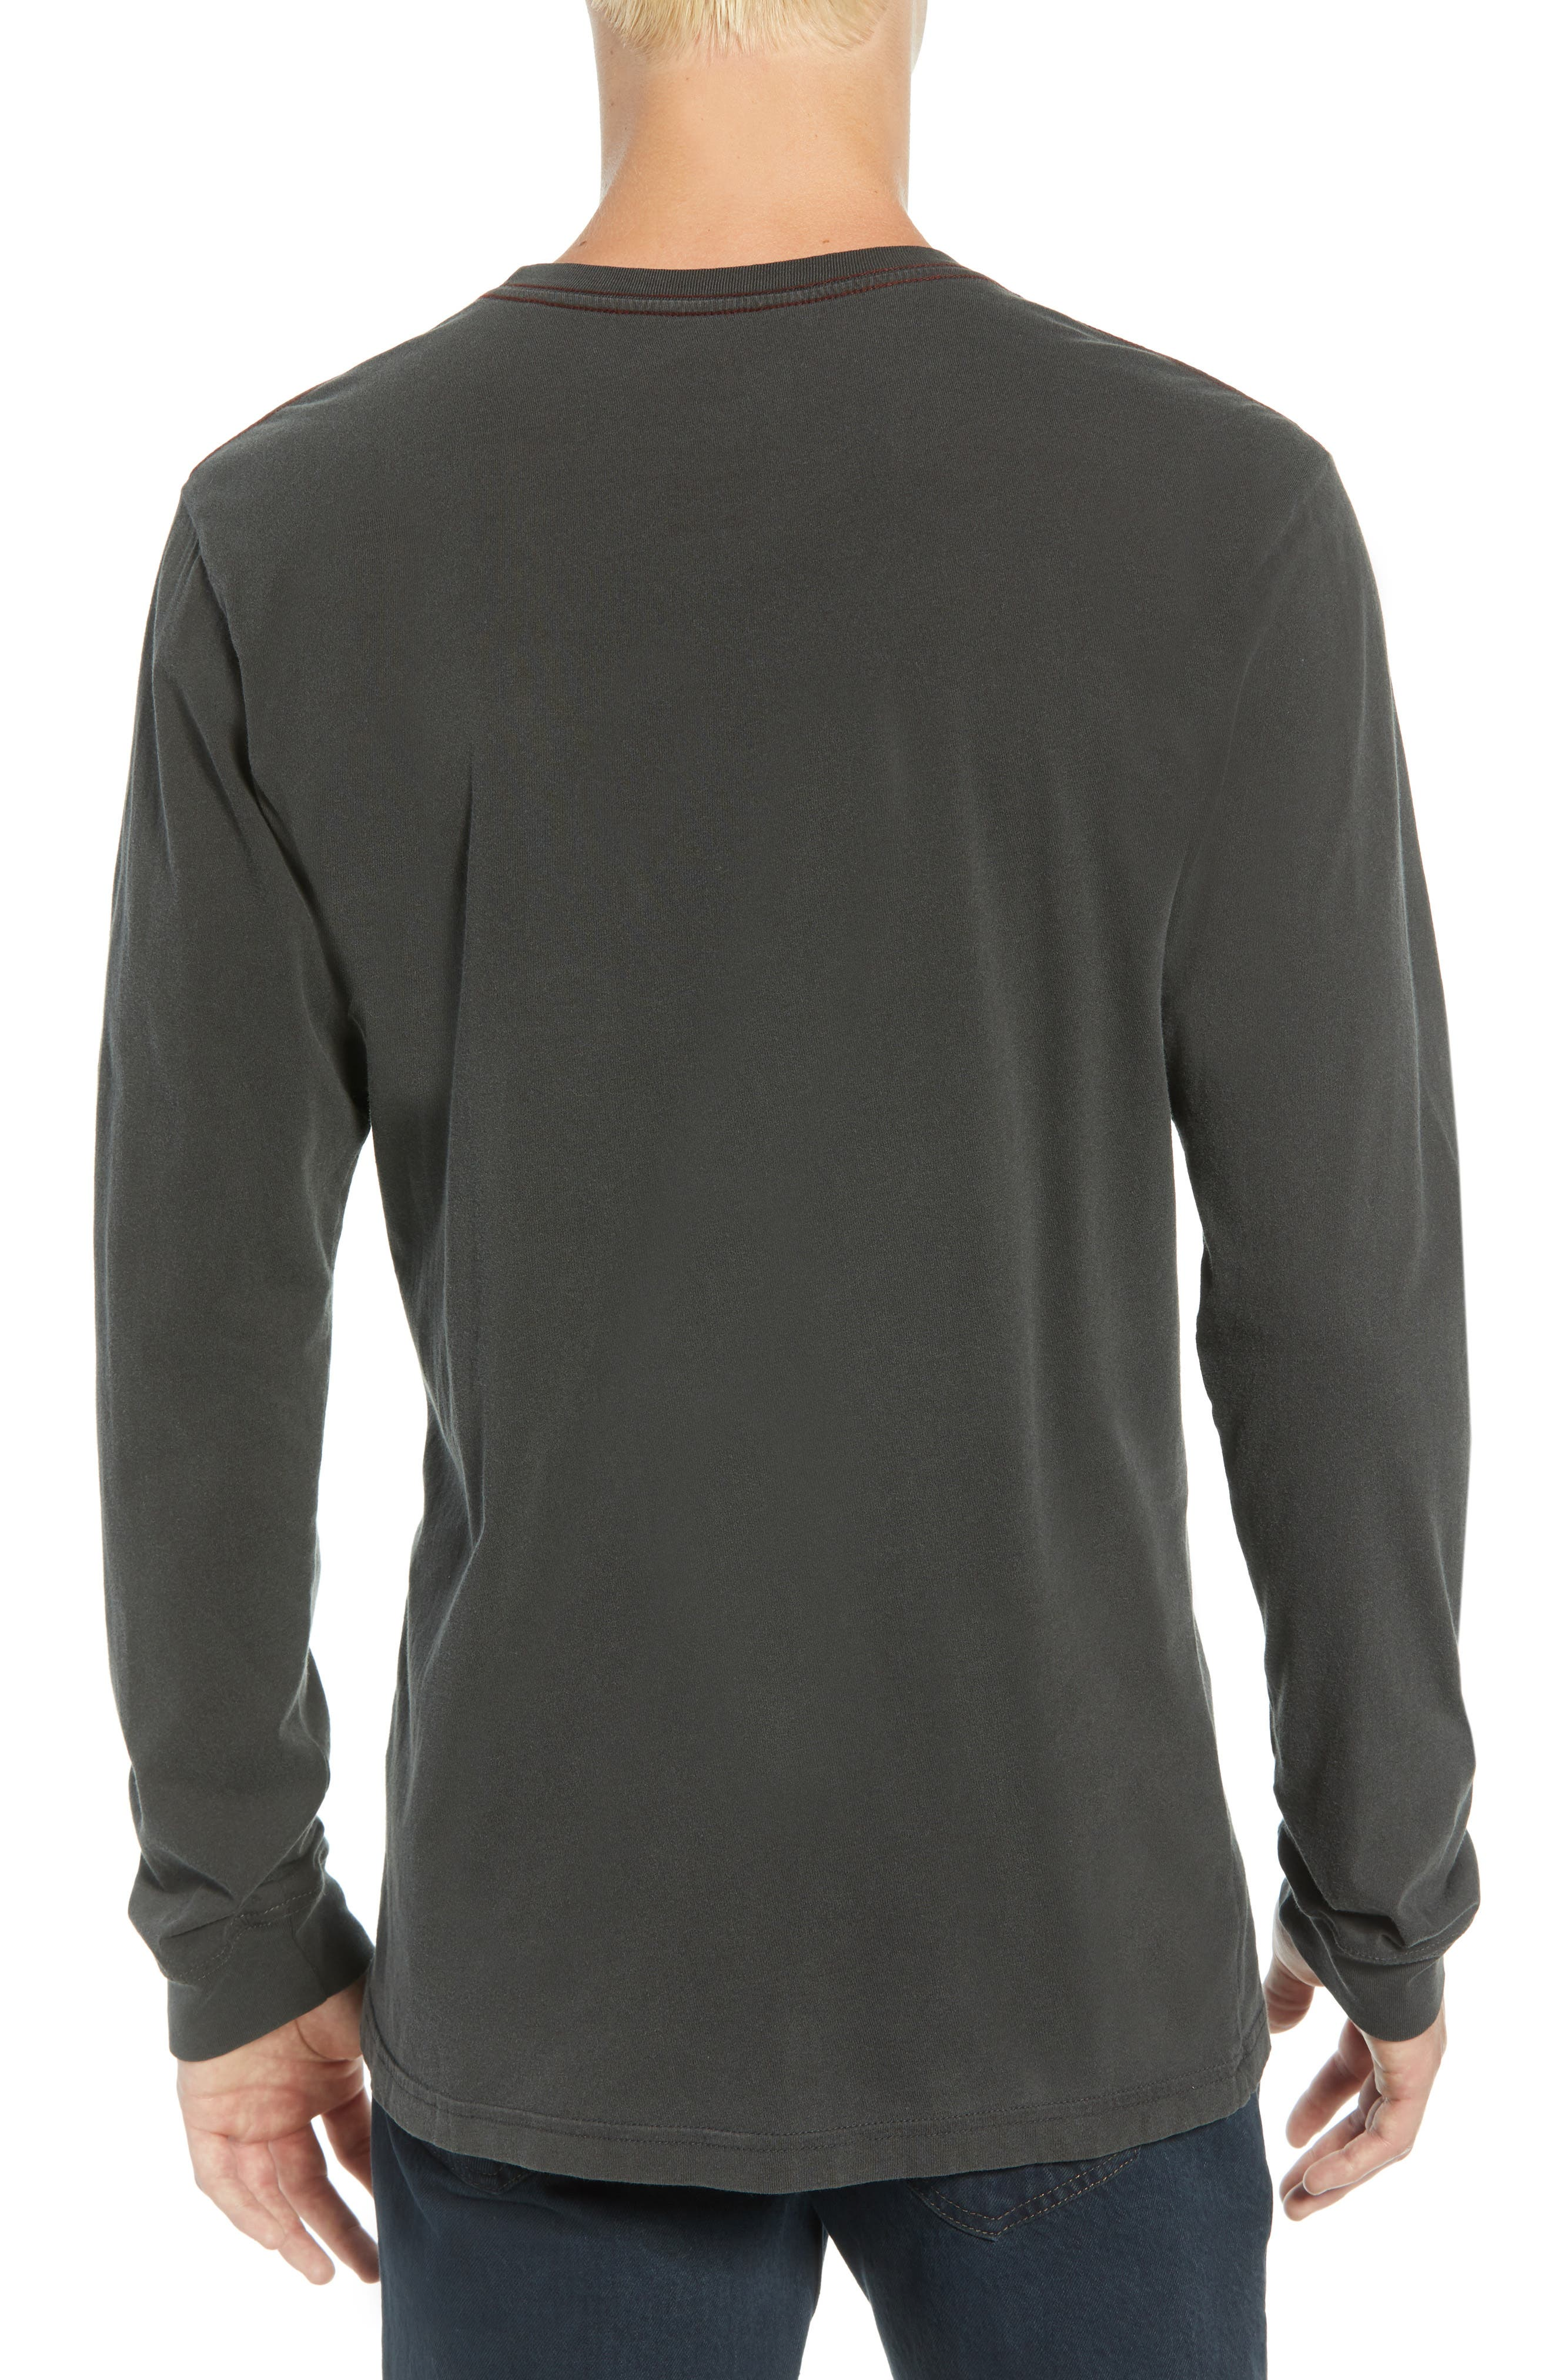 PTC Pigment Long Sleeve T-Shirt,                             Alternate thumbnail 2, color,                             PIRATE BLACK